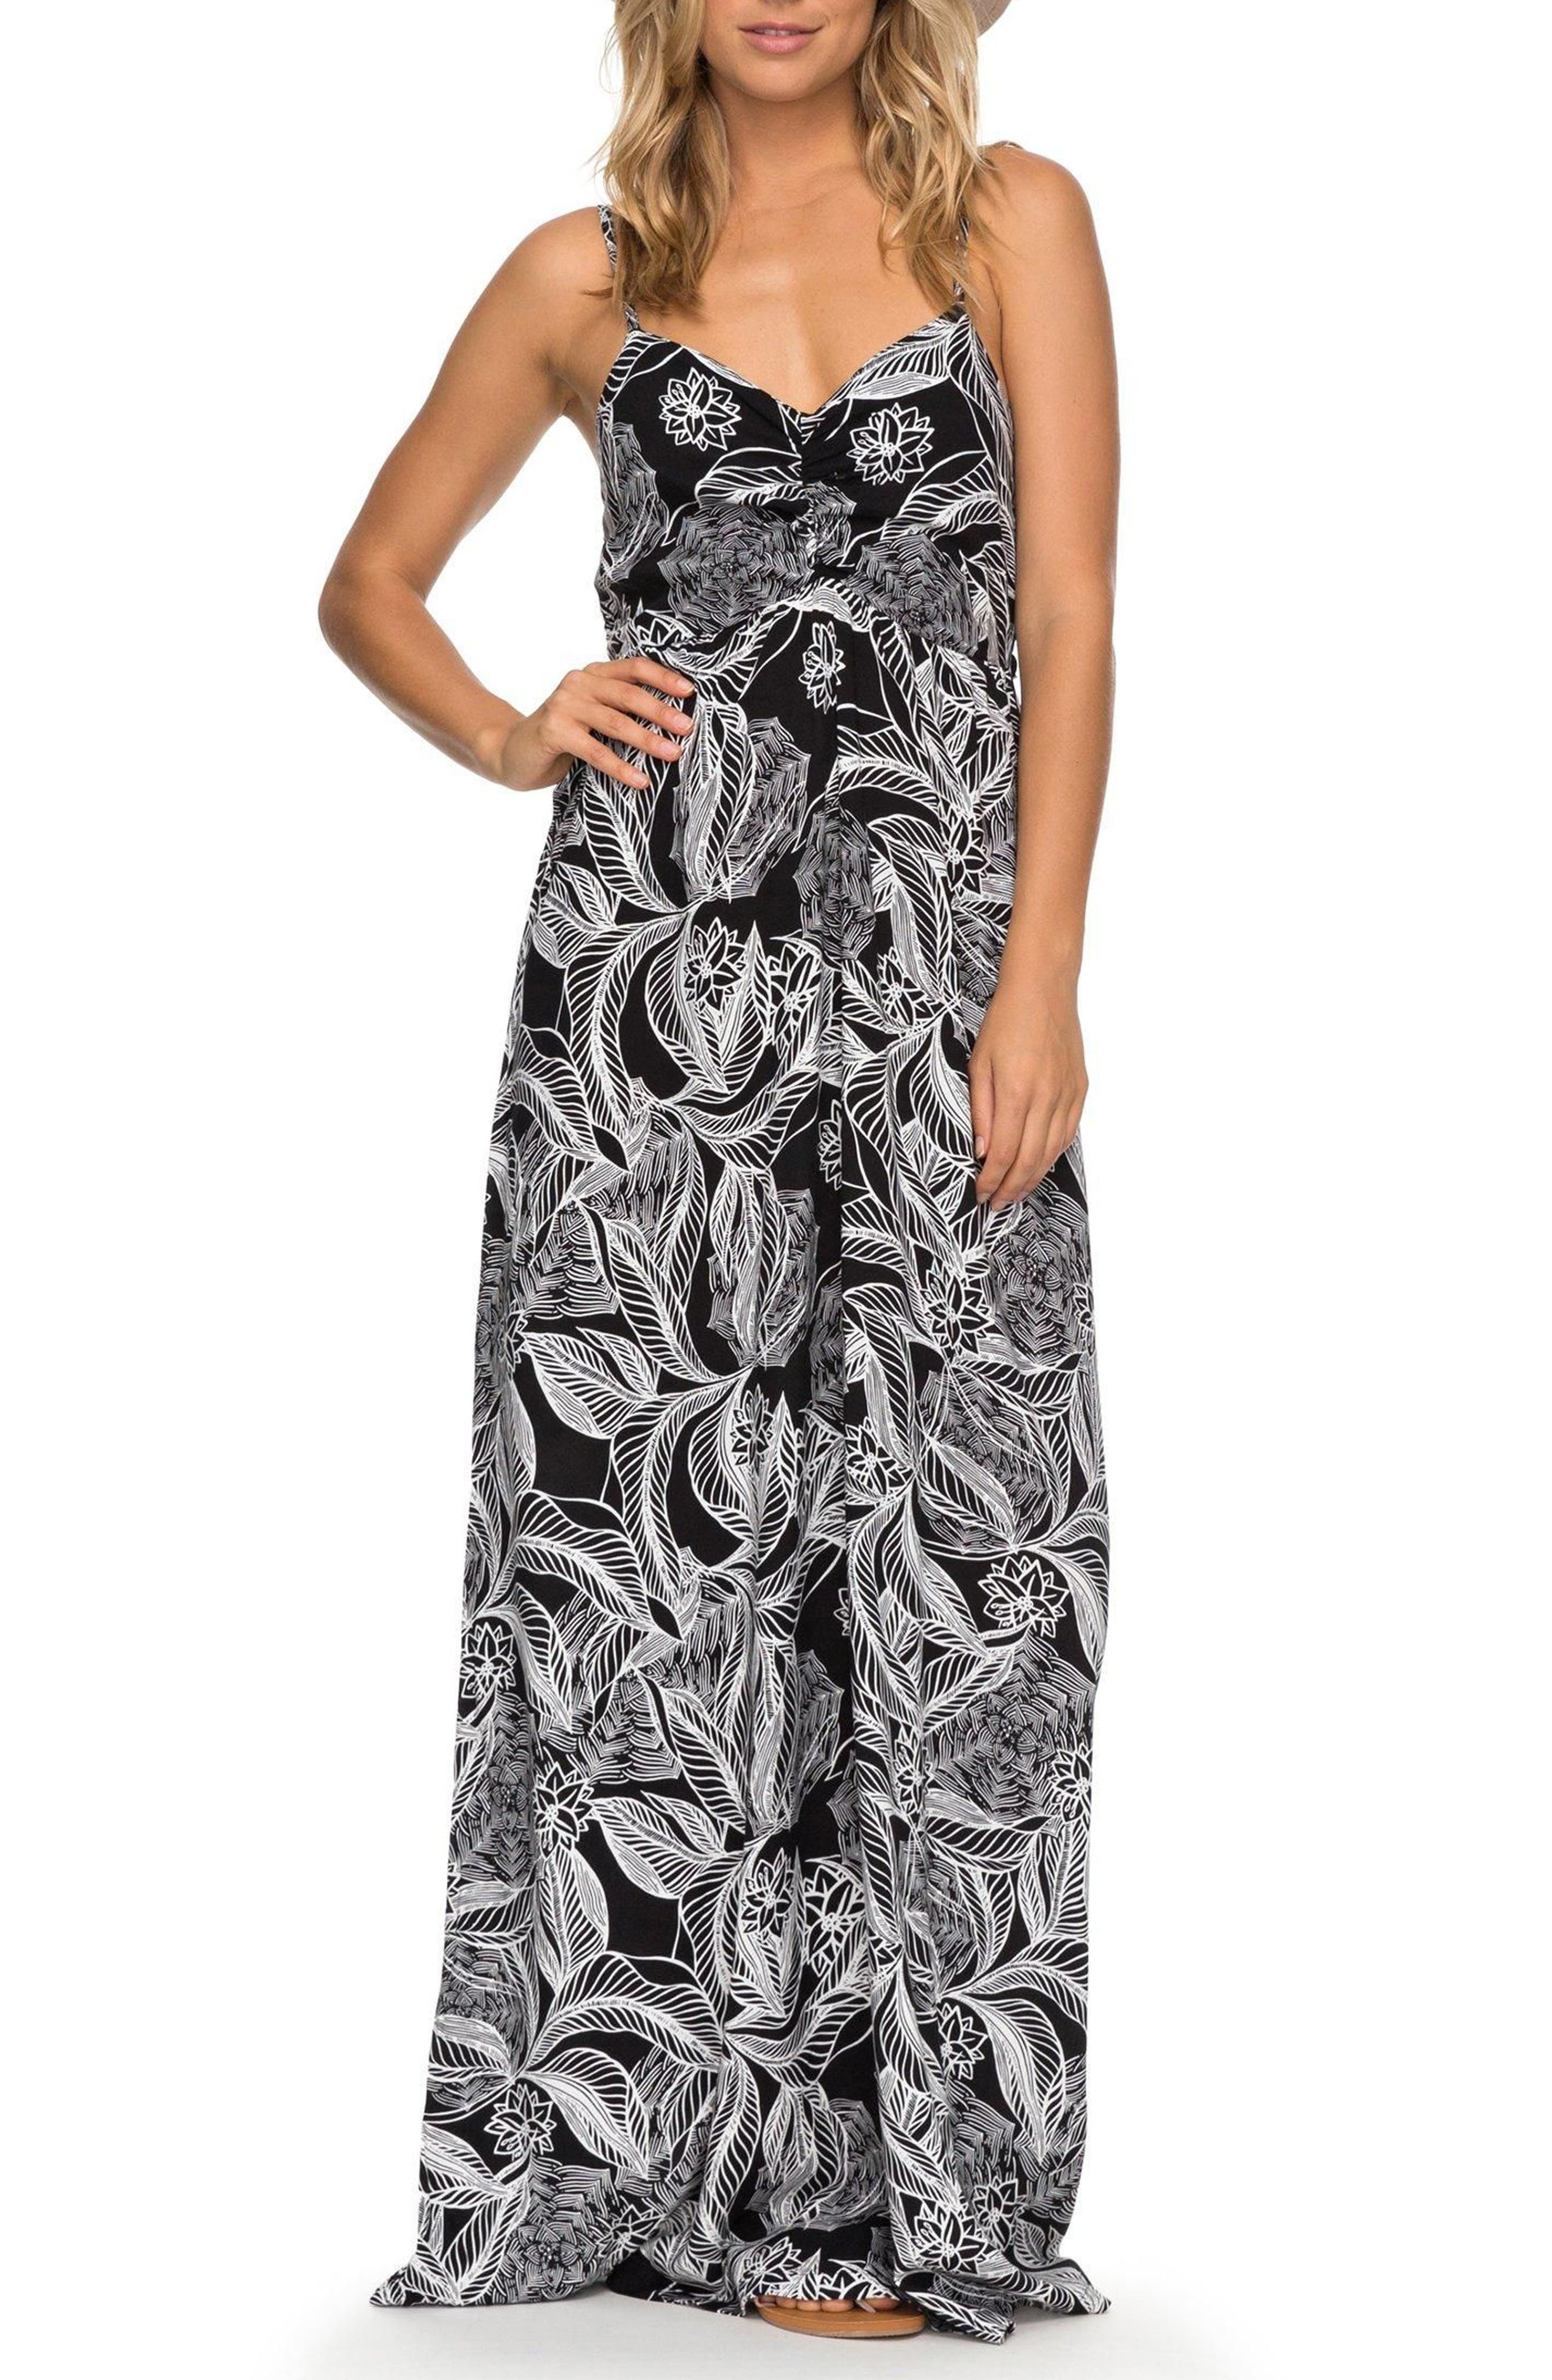 Brilliant Stars Print Maxi Dress,                             Main thumbnail 1, color,                             002